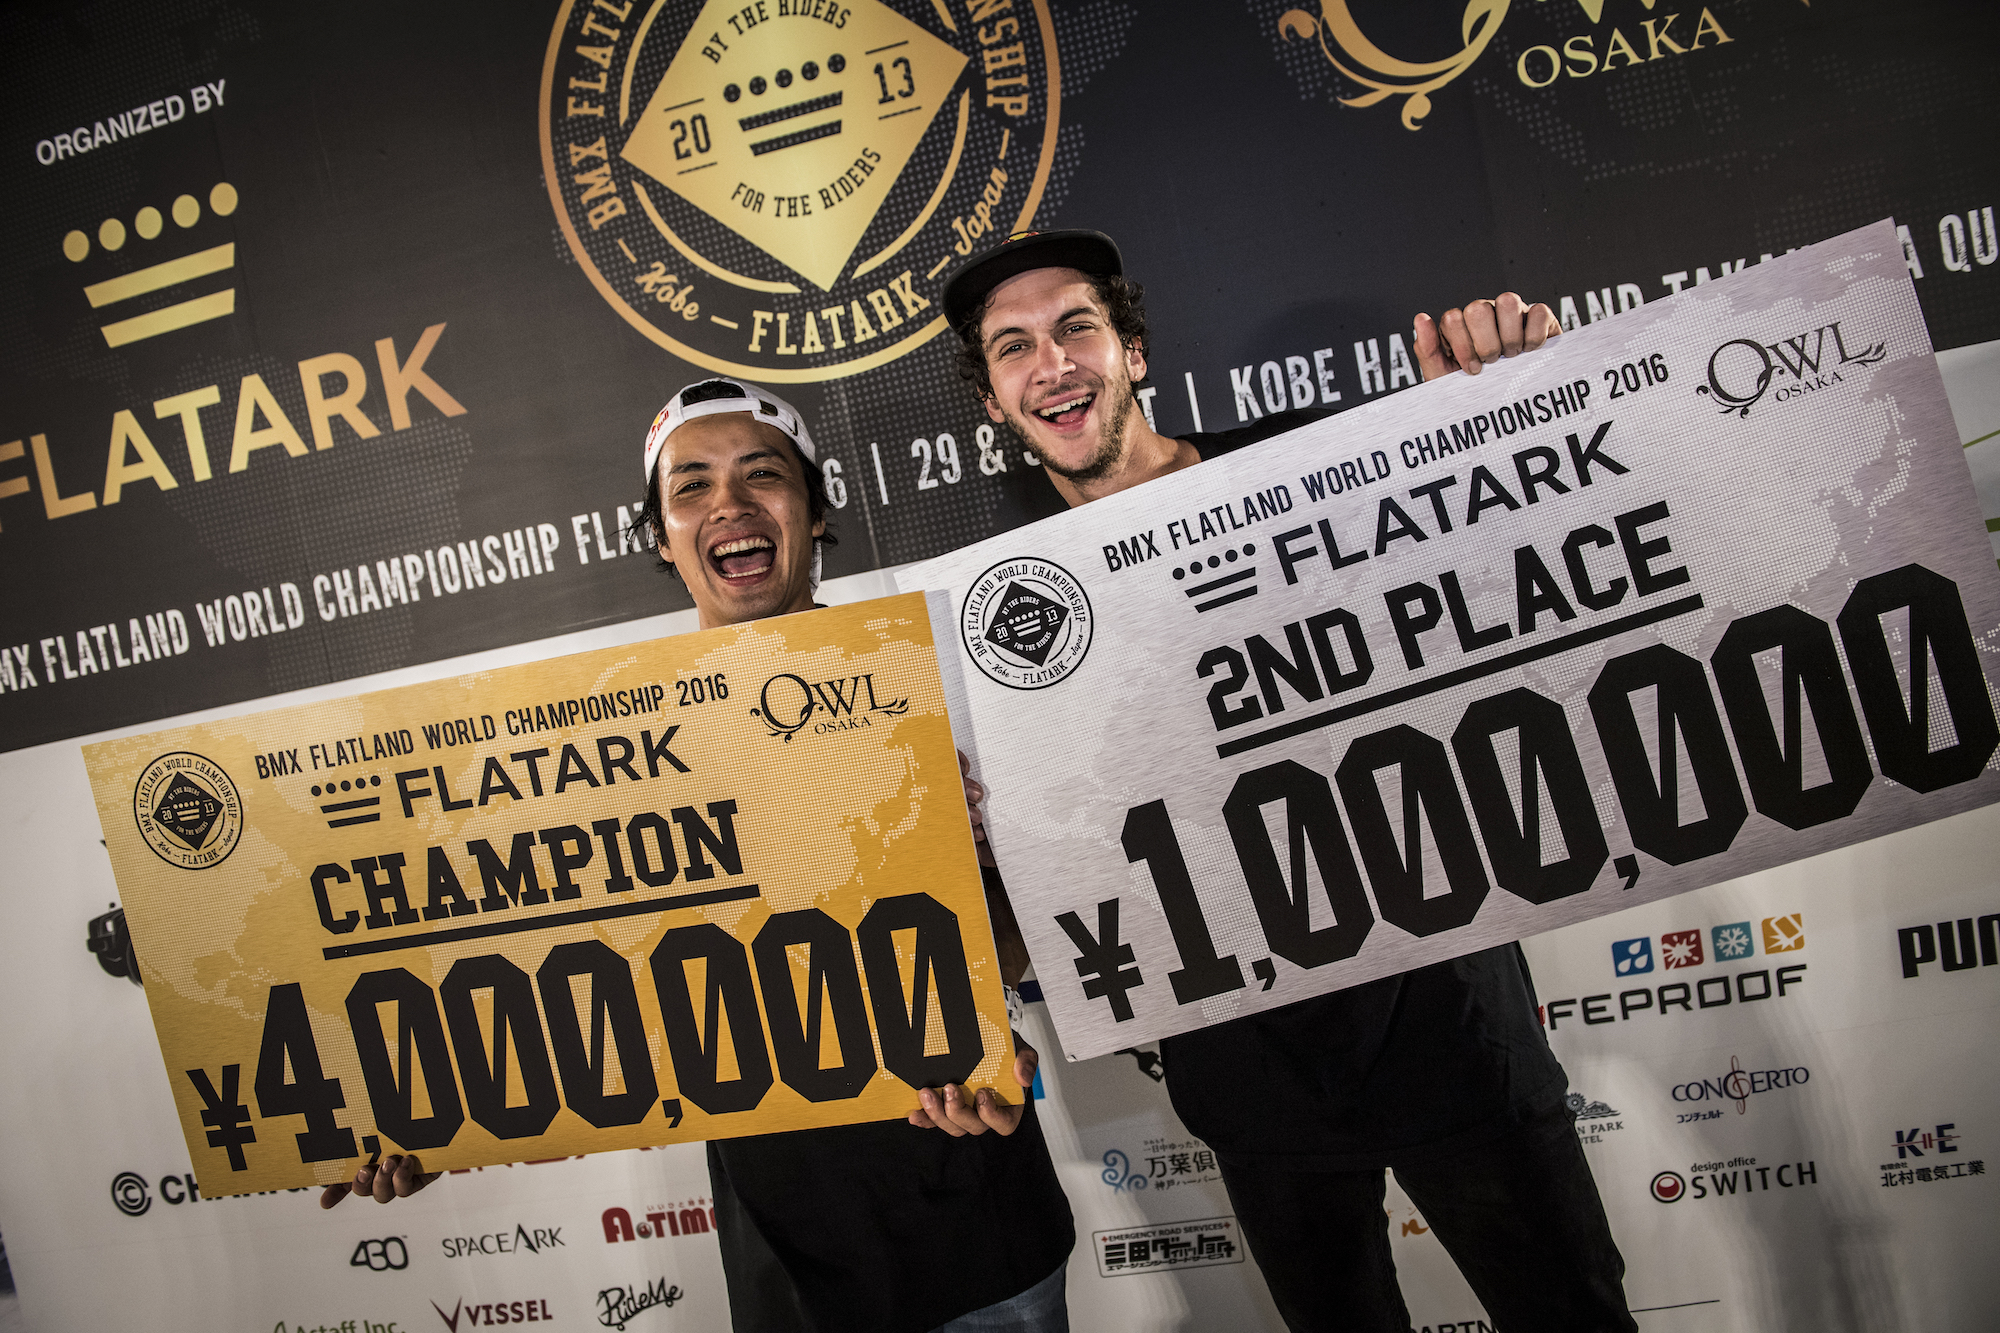 BMX フラットランド真の世界王者決定 戦「FLAT ARK」で内野洋平が優勝!